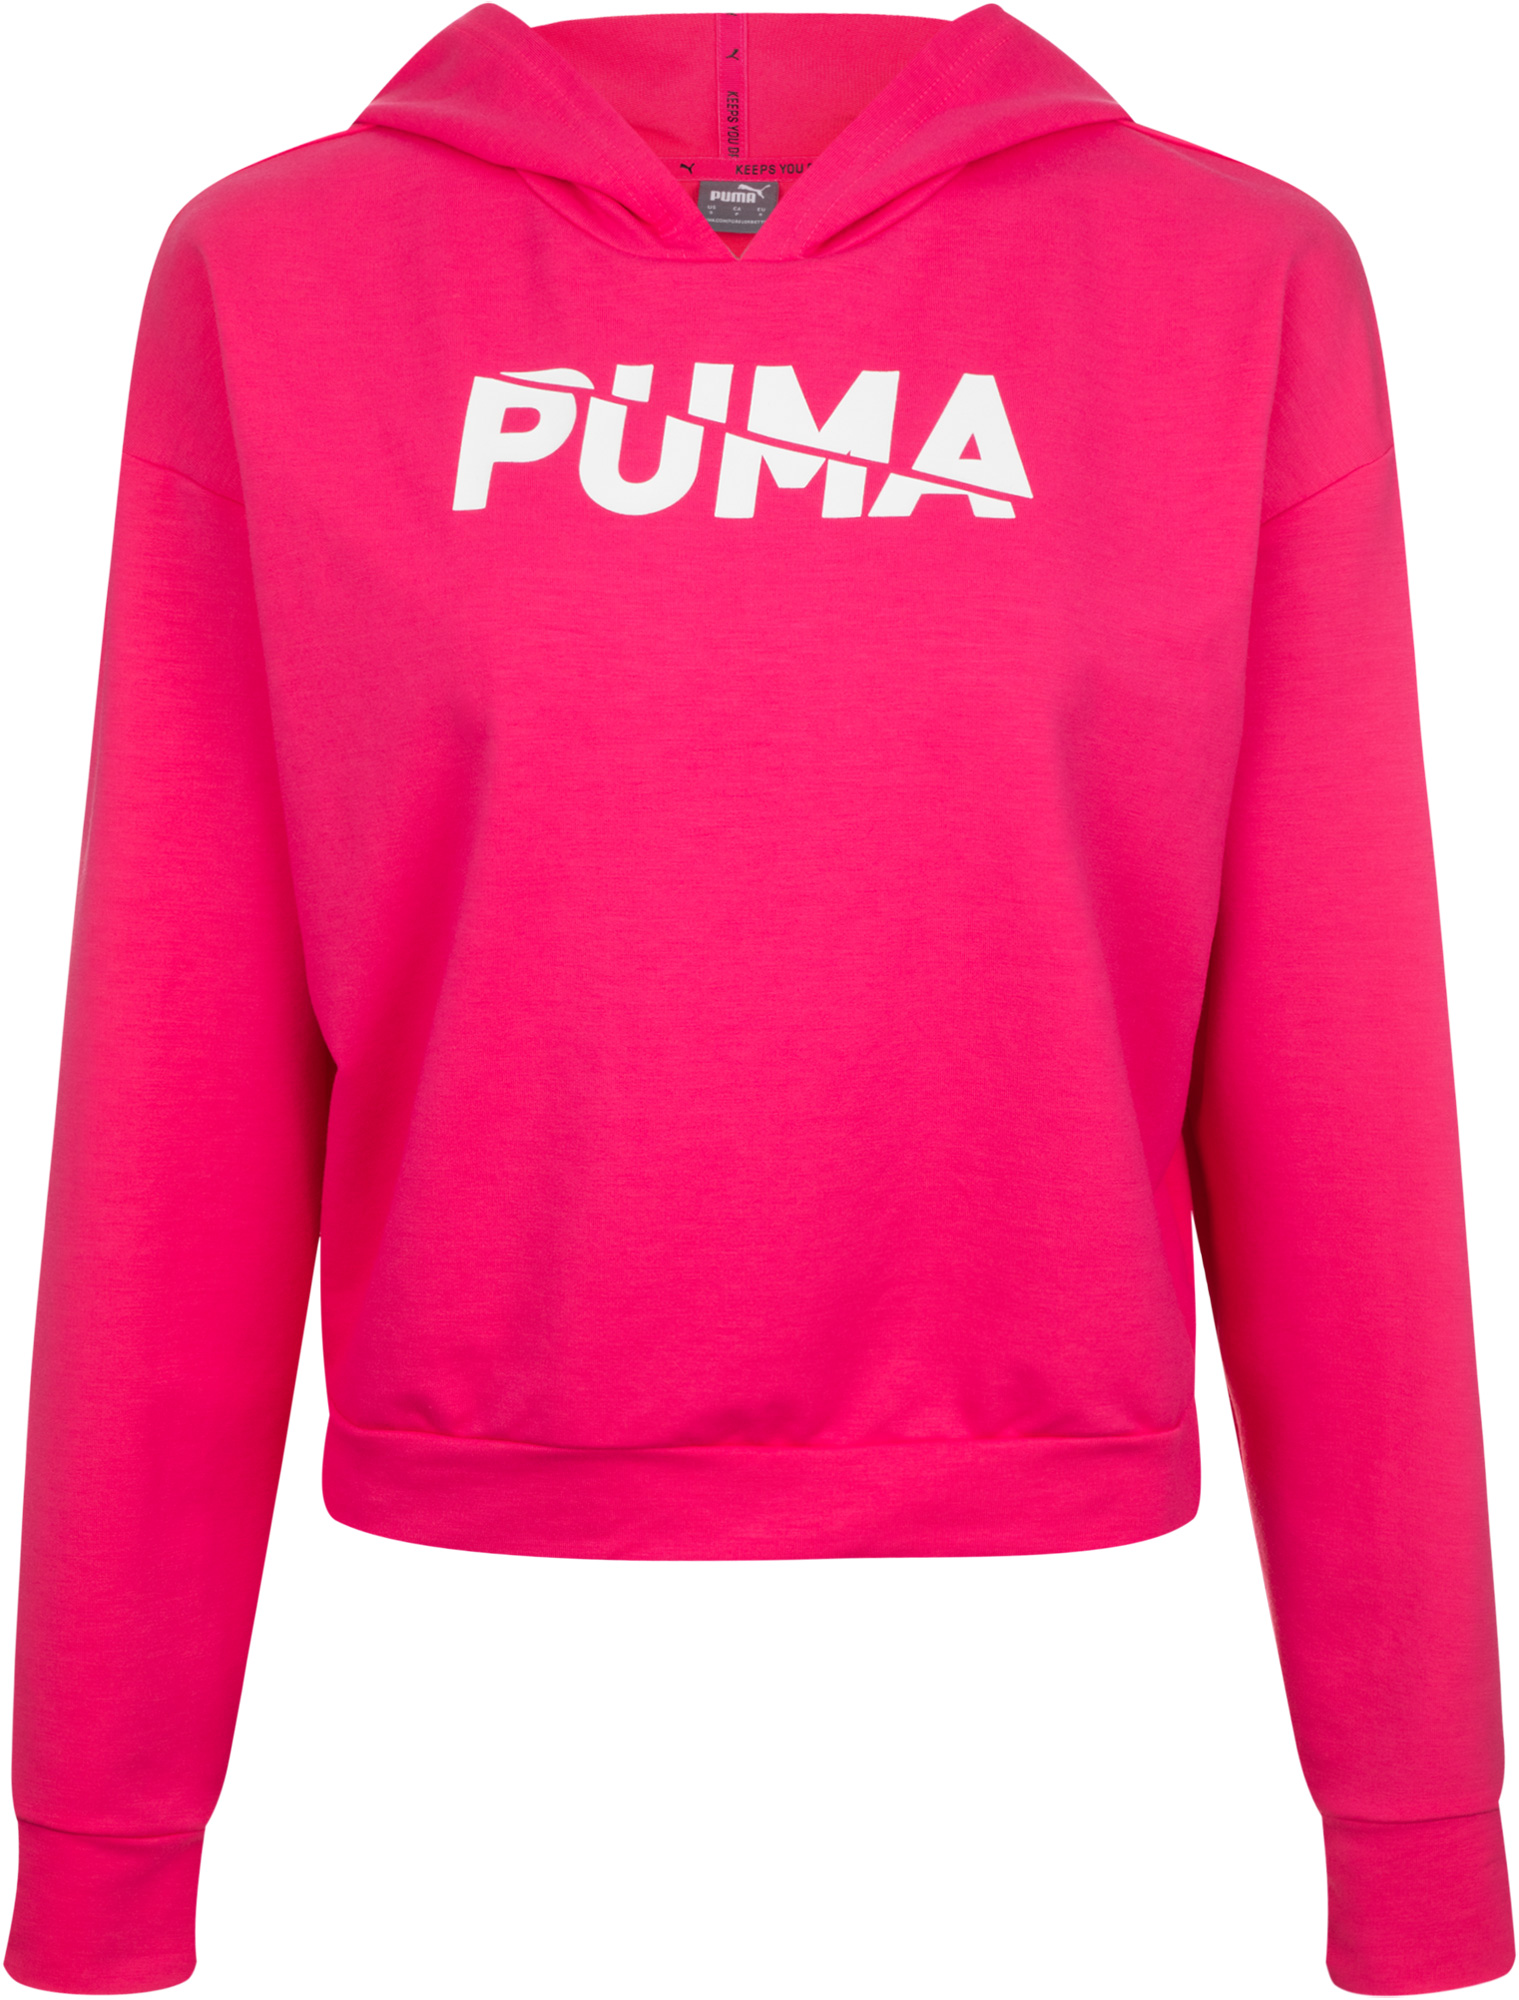 Puma Худи женская Puma Modern Sports, размер 44-46 puma худи женская puma amplified cropped размер 42 44